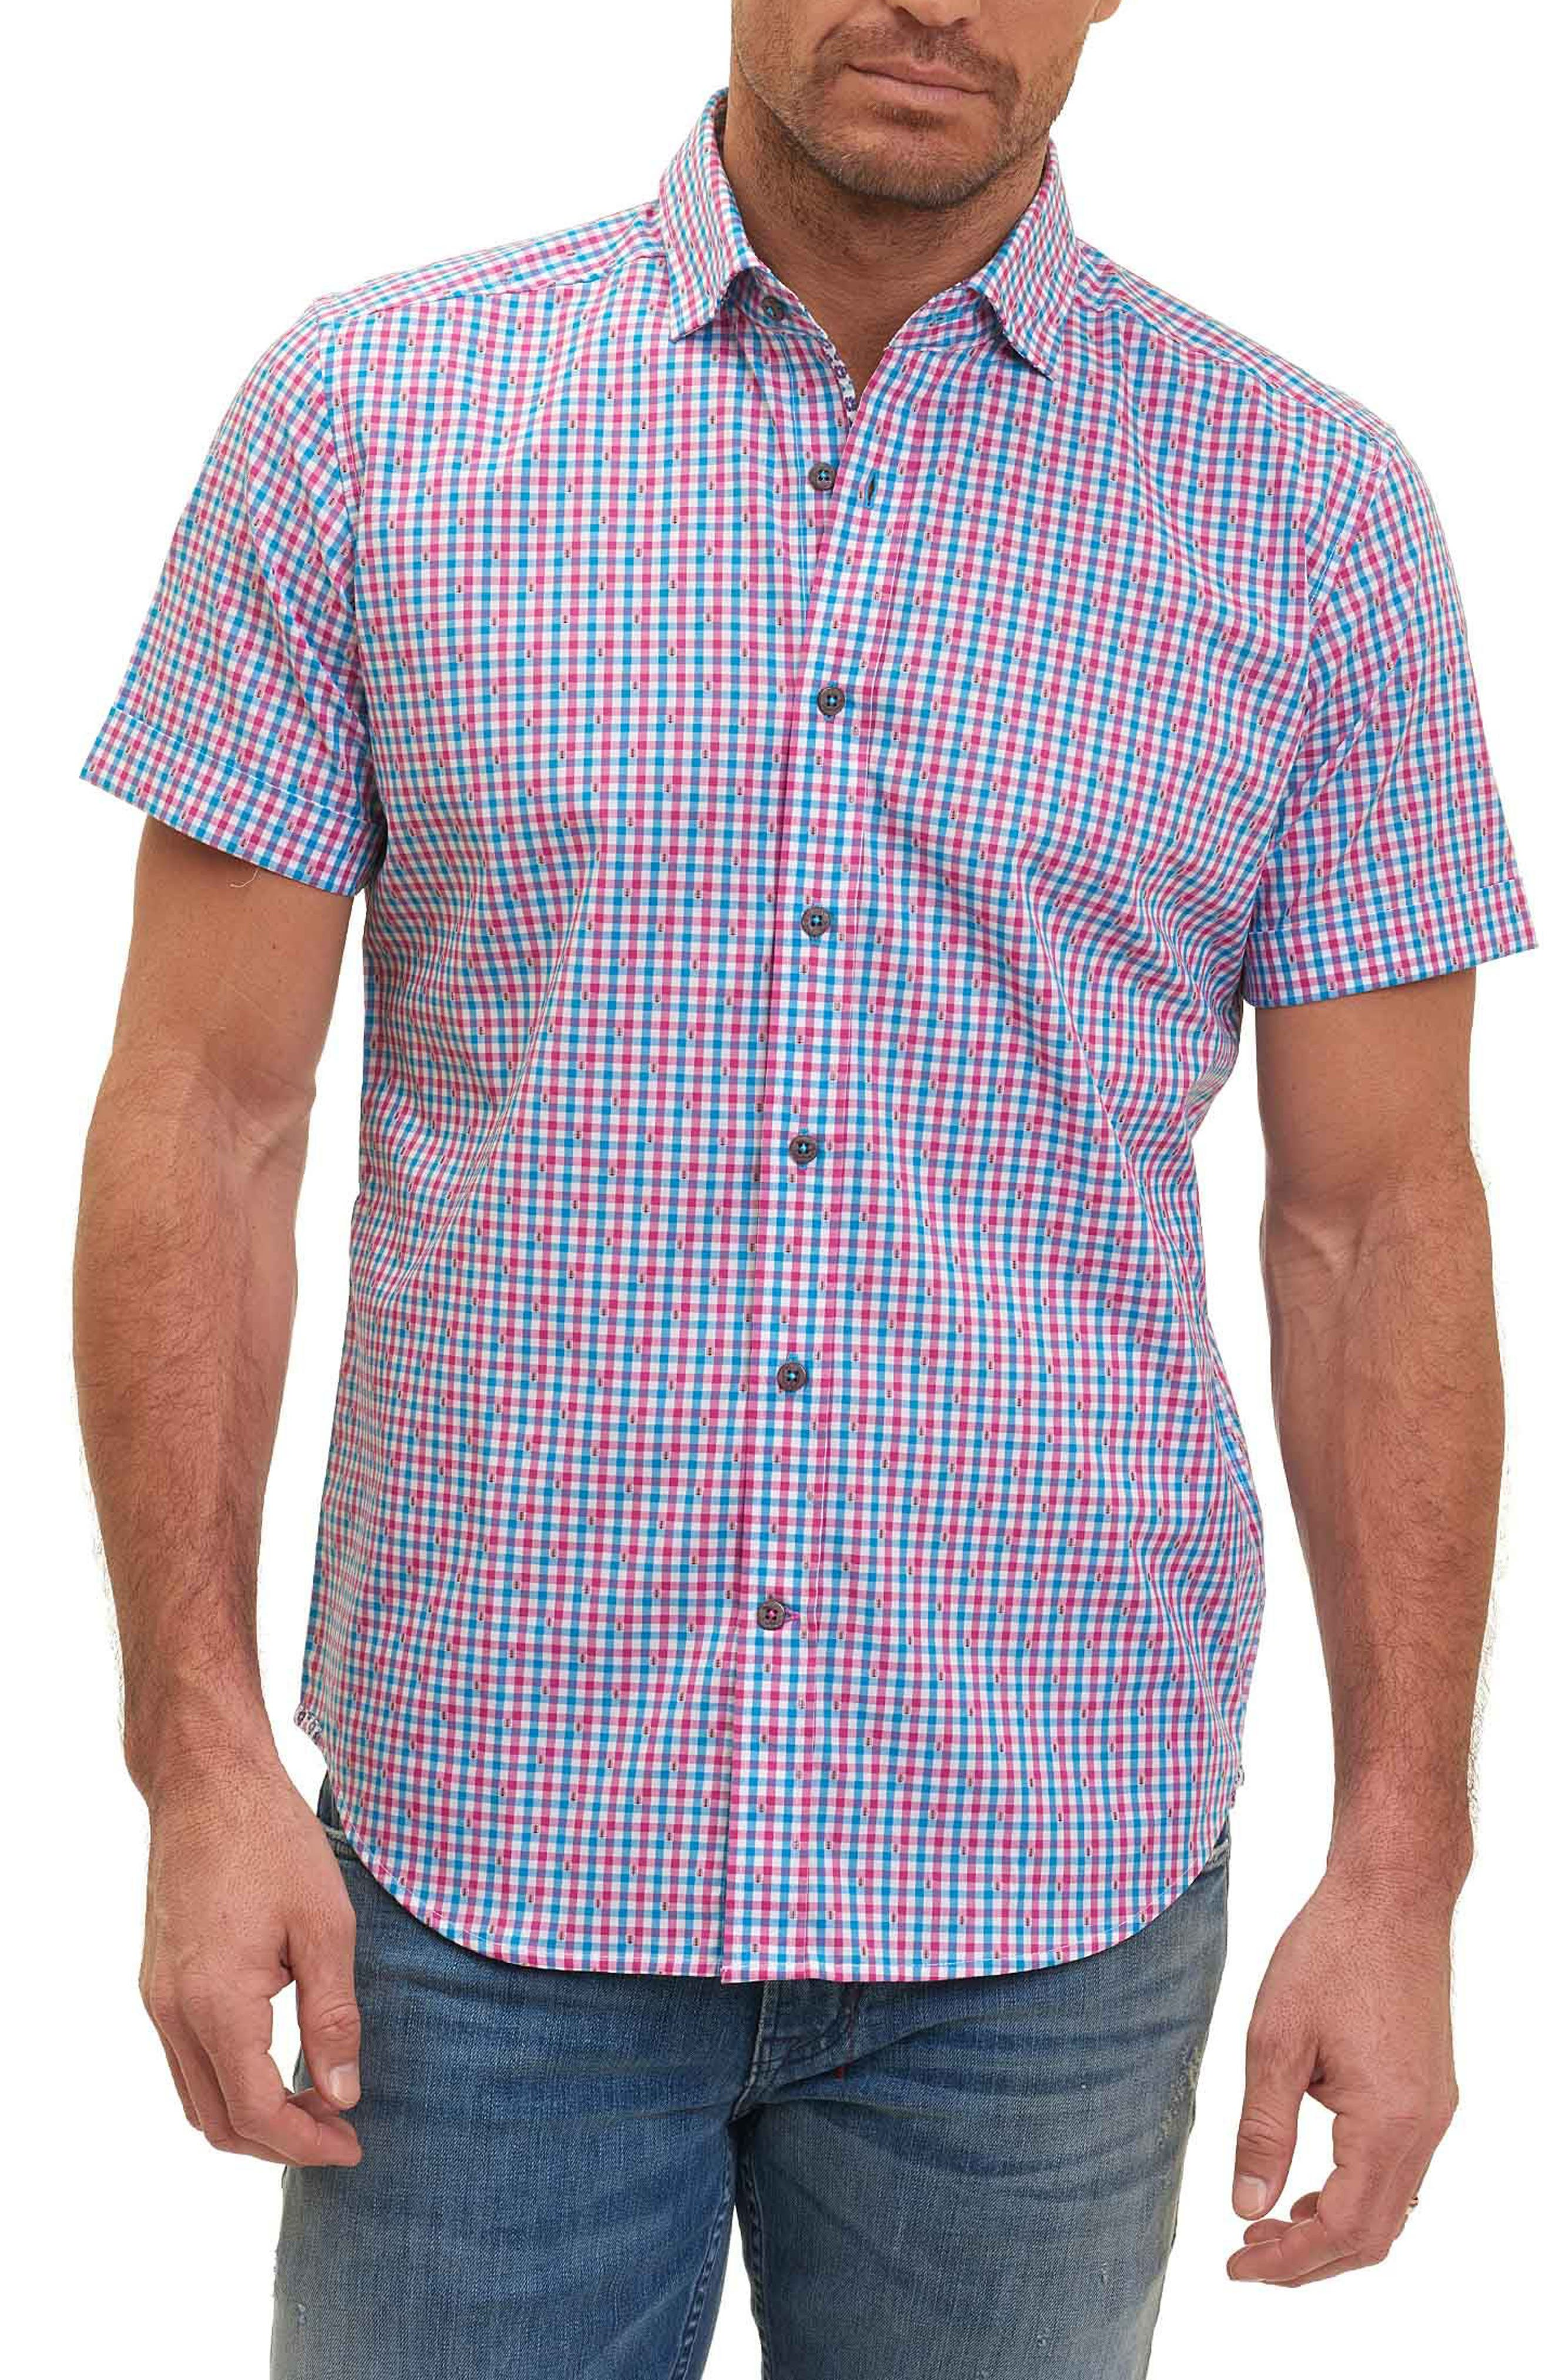 Makai Tailored Fit Gingham Sport Shirt,                             Main thumbnail 1, color,                             Berry